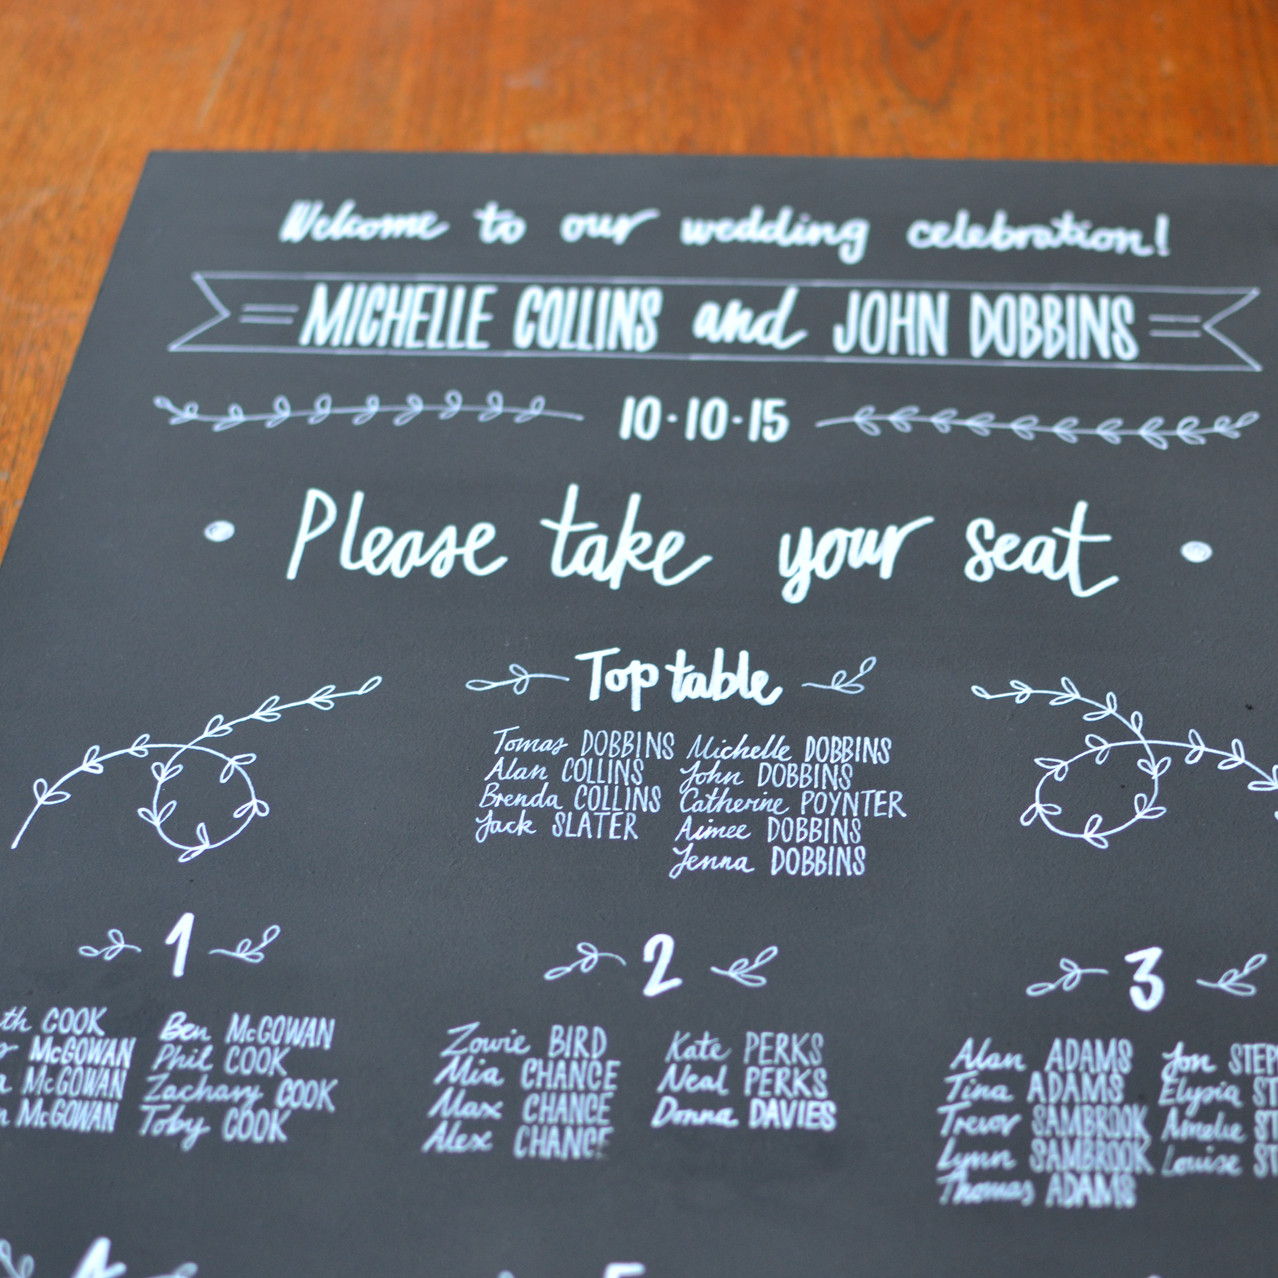 Chalkboard table plan - Michelle and John (1)